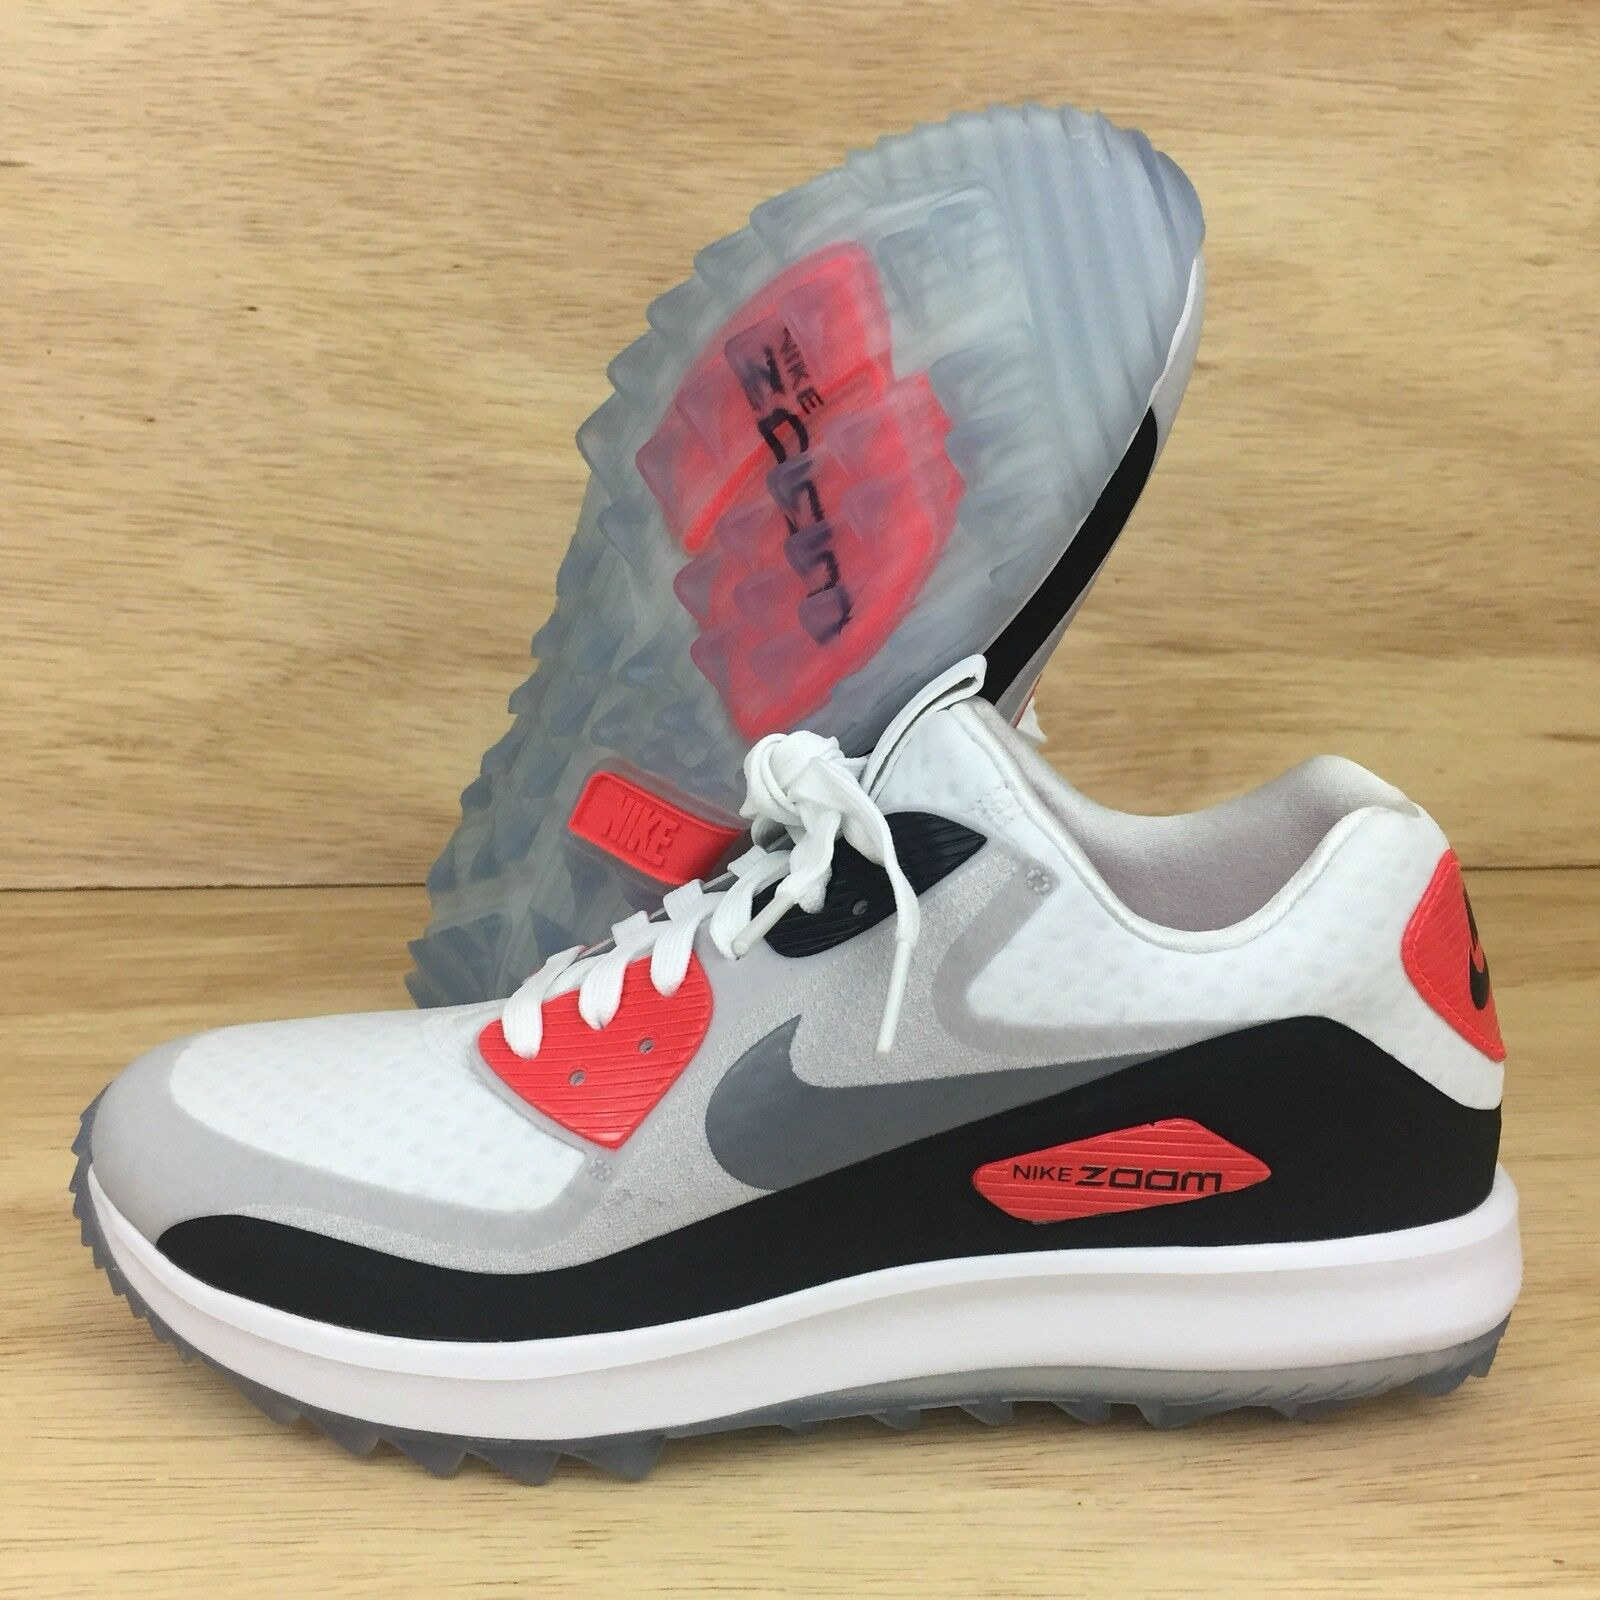 Nike Air Zum 90 E Golf Donne Infrarossi 844648 100 Misura Rory Mcilroy Misura 100 8,5 3730ec